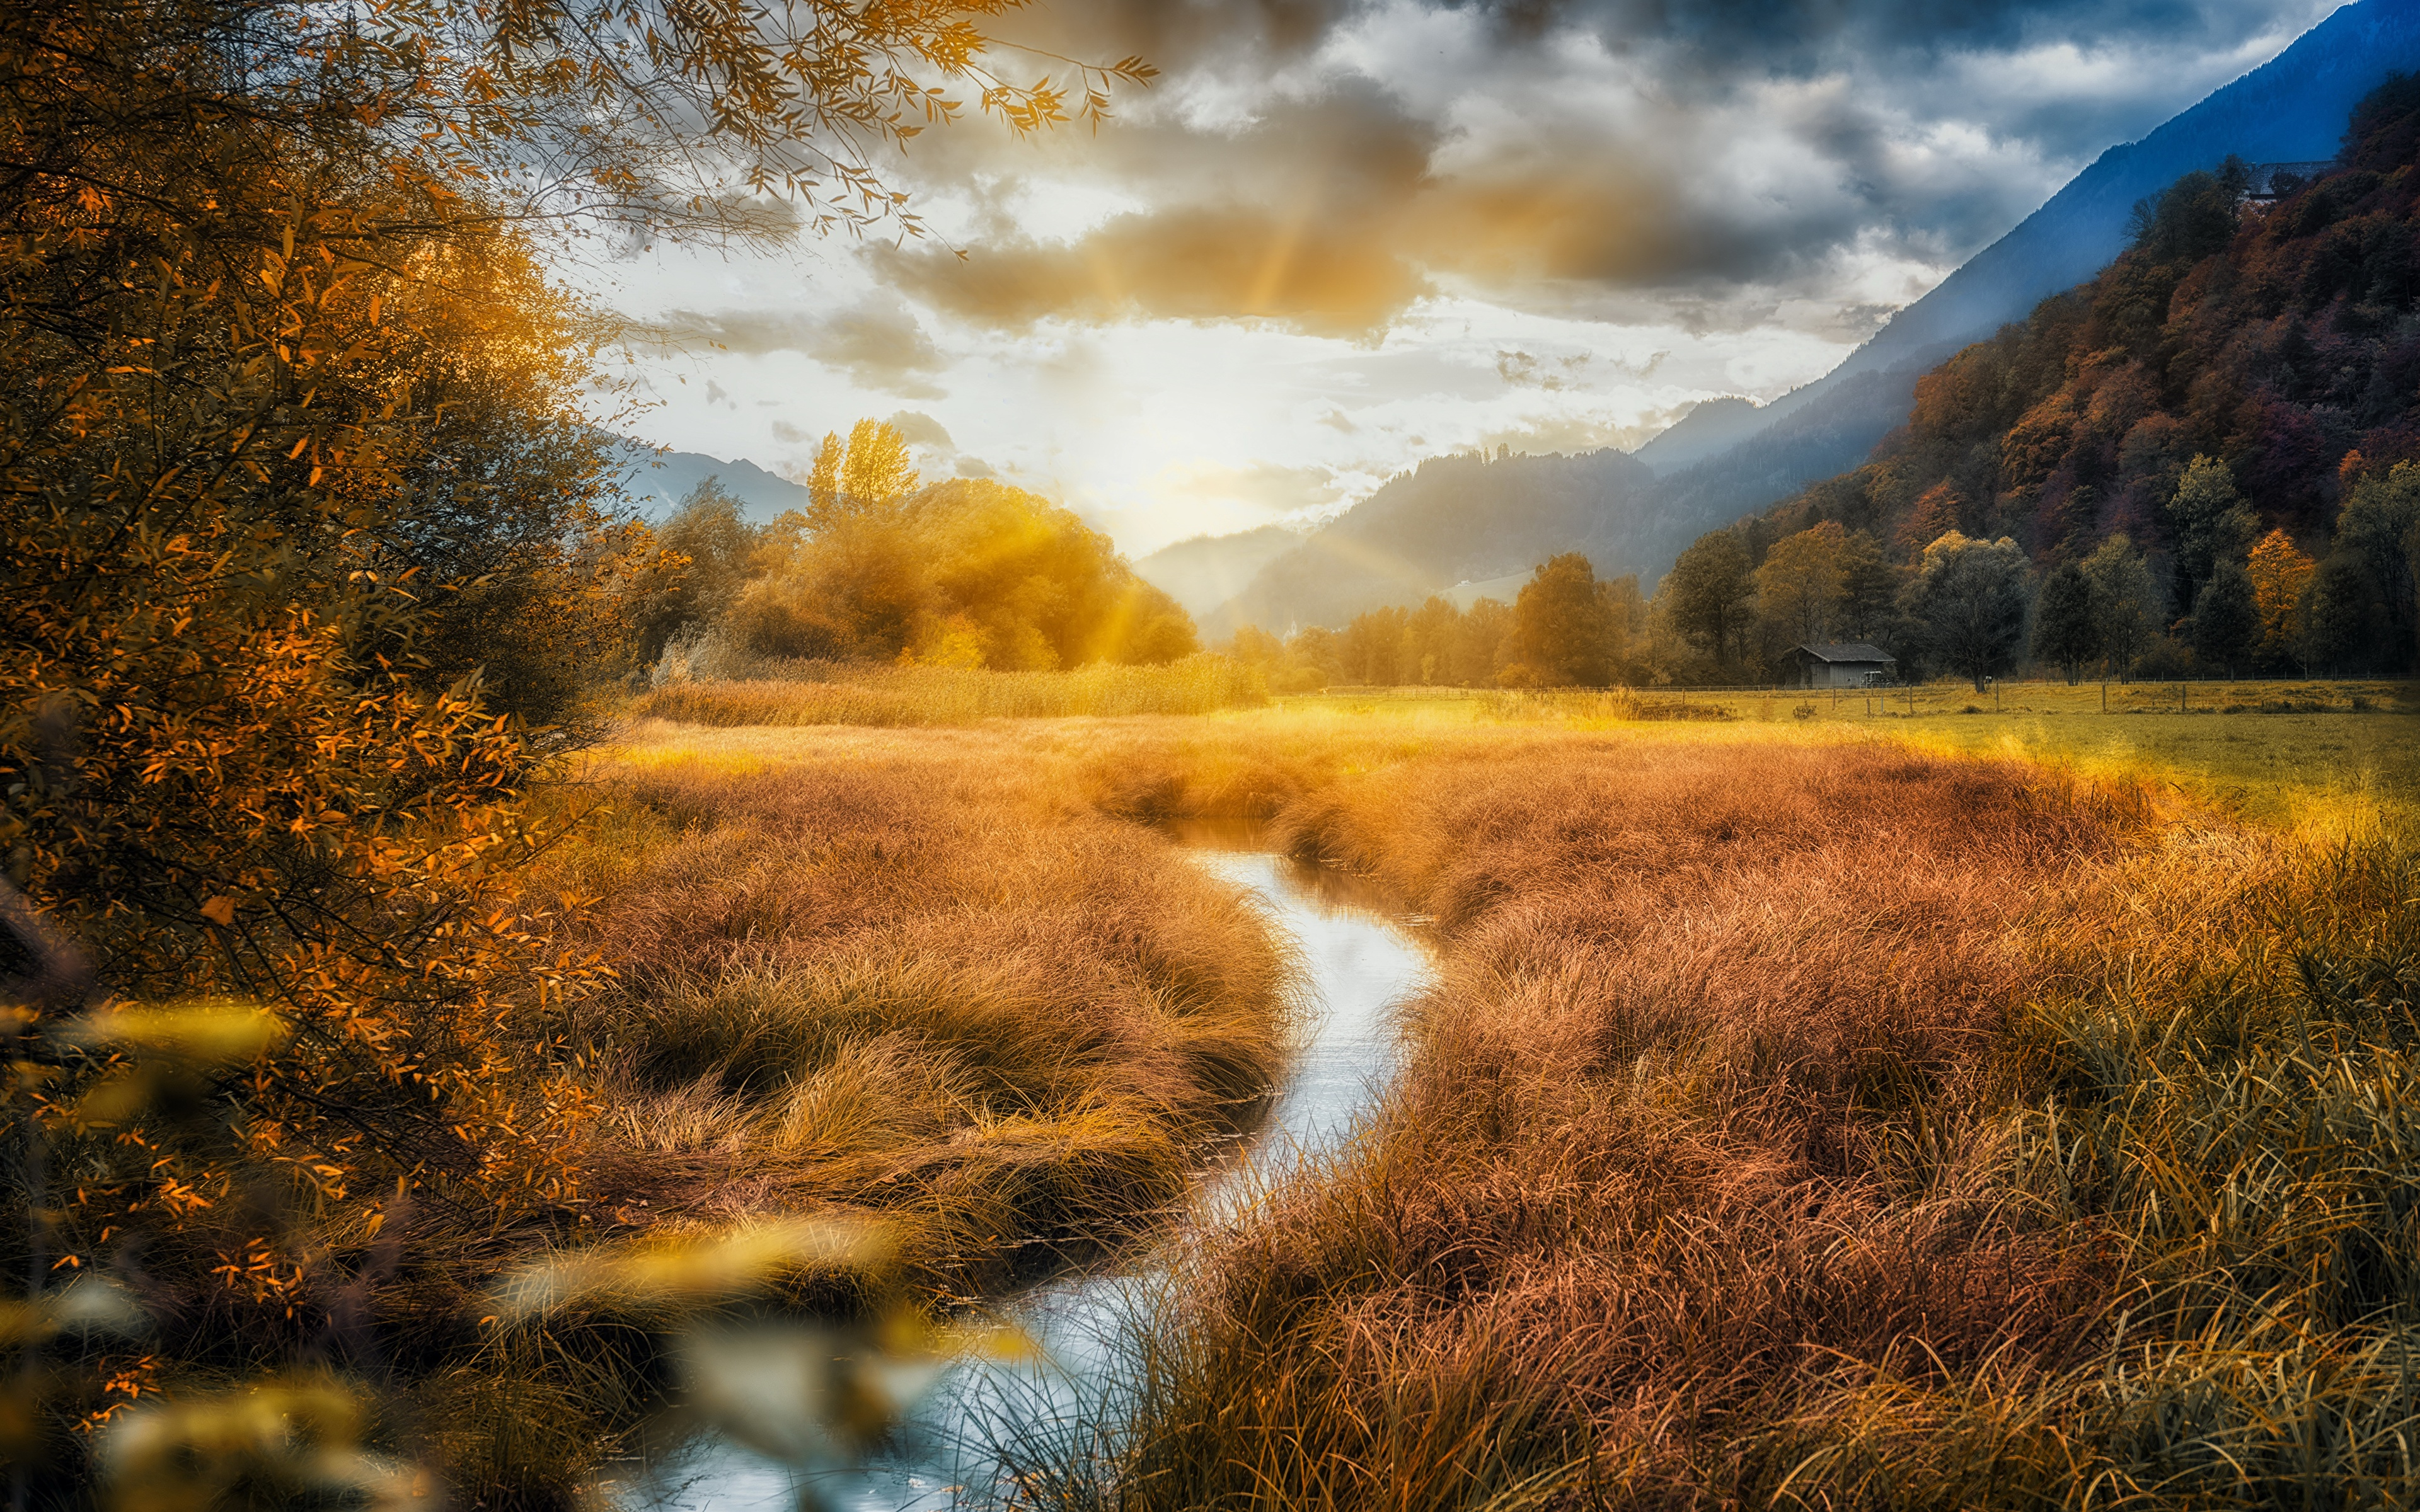 Фото Горы Природа осенние Поля река облачно 3840x2400 гора Осень Реки речка облако Облака